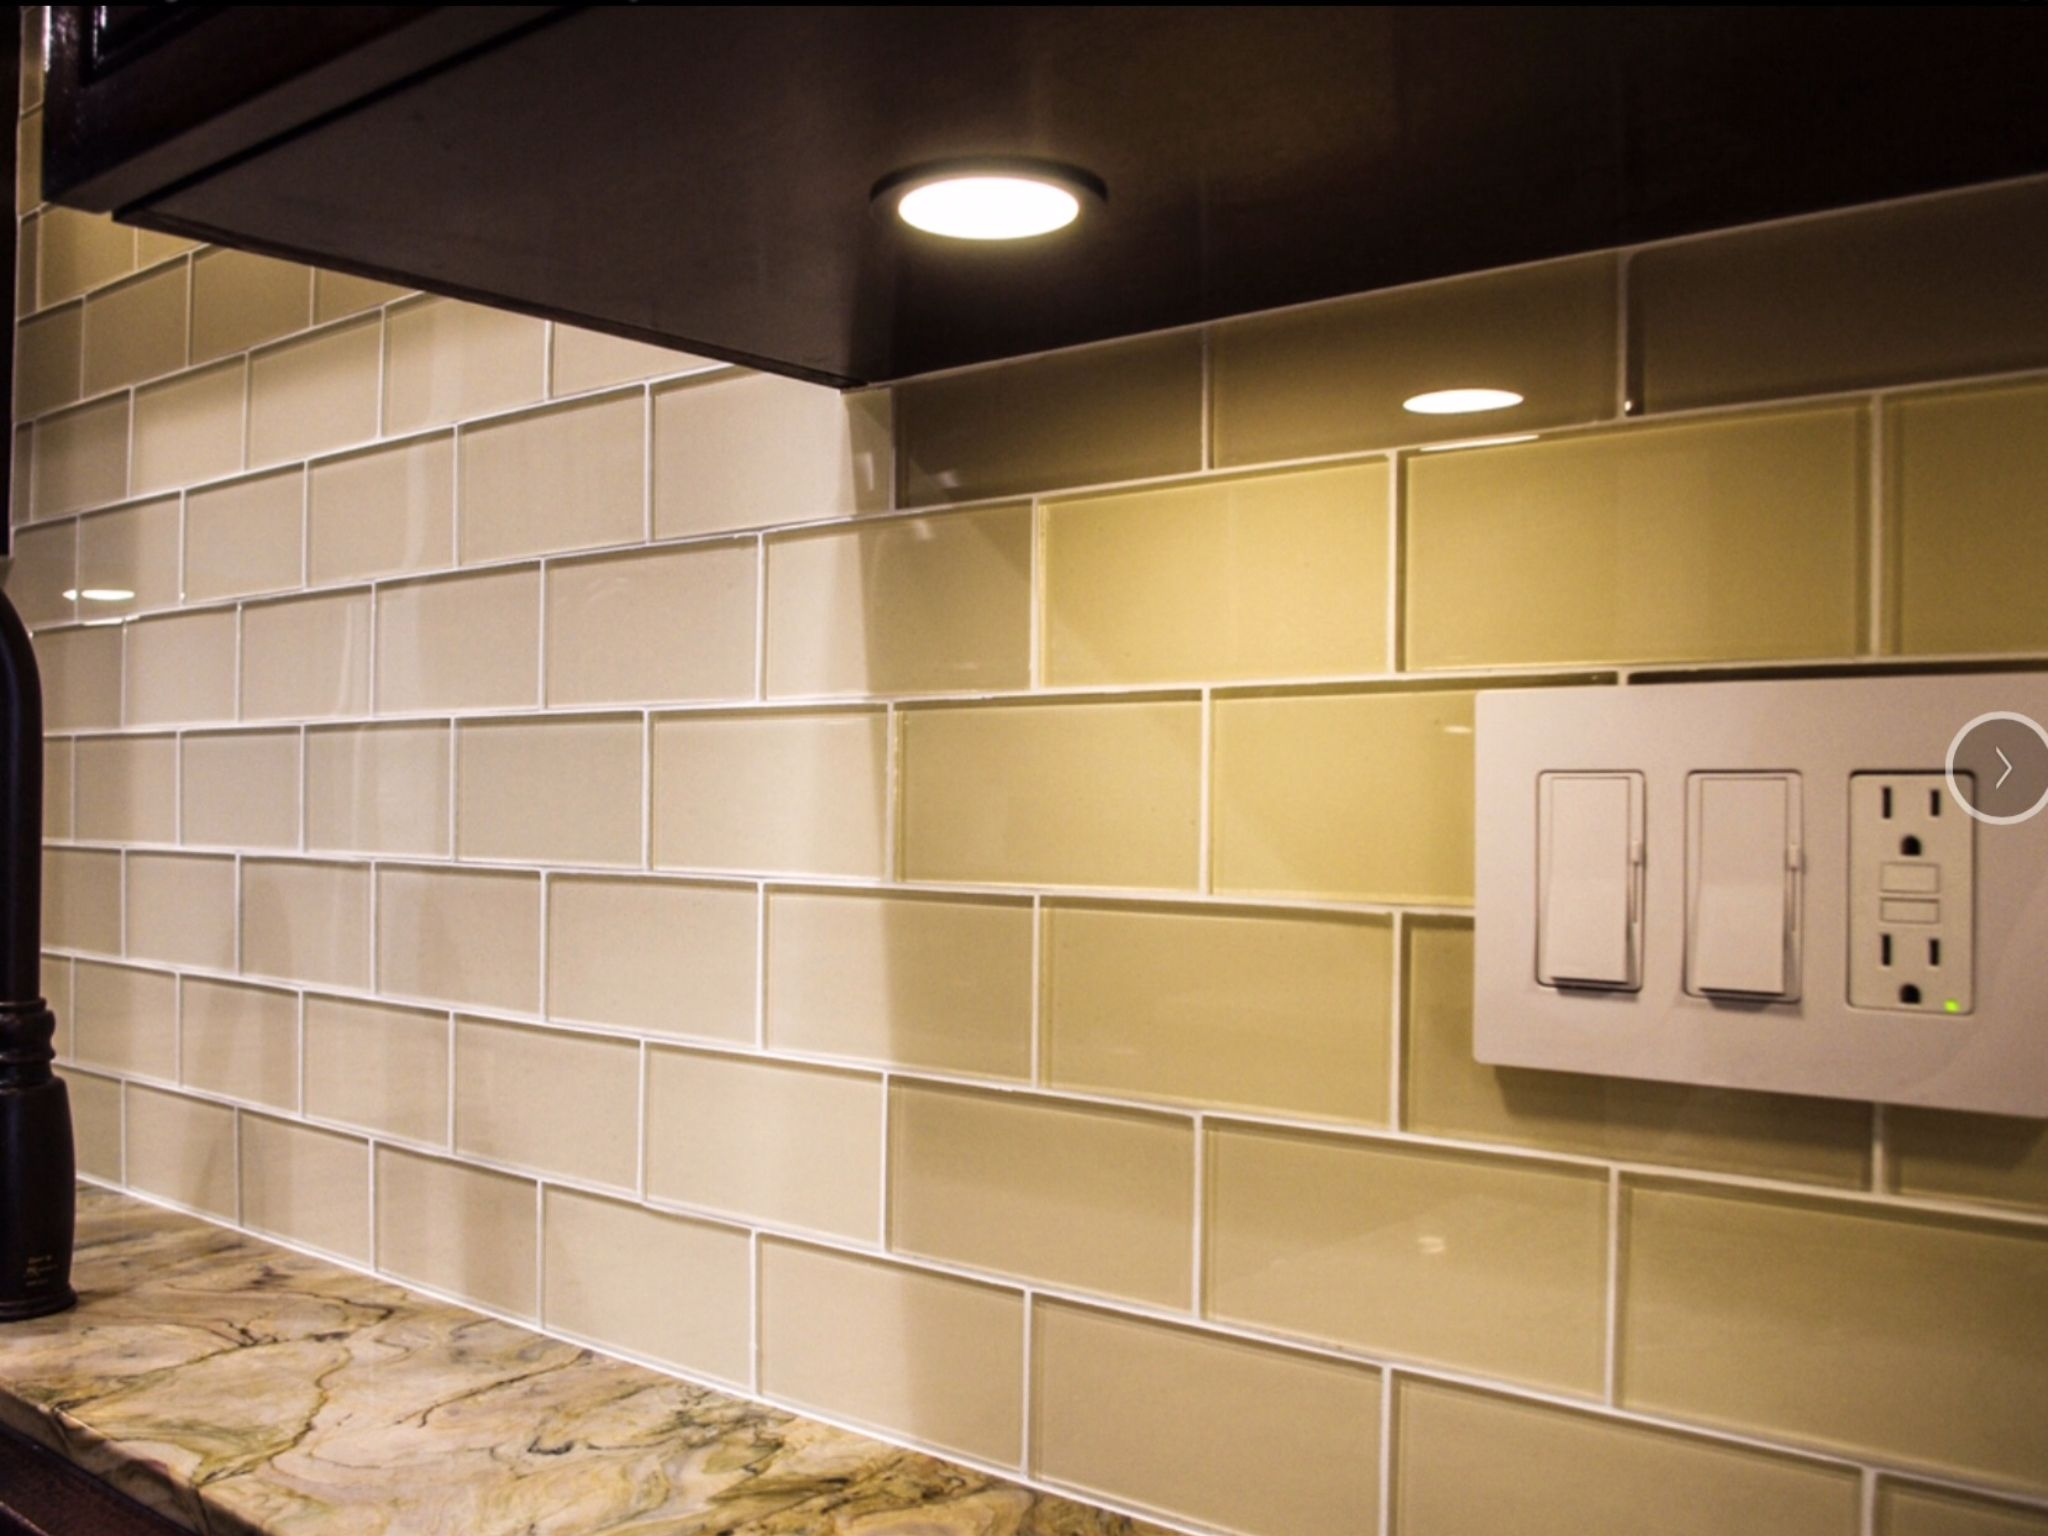 Glass Subway Tile Subway Tile Outlet Cream Kitchen Tiles